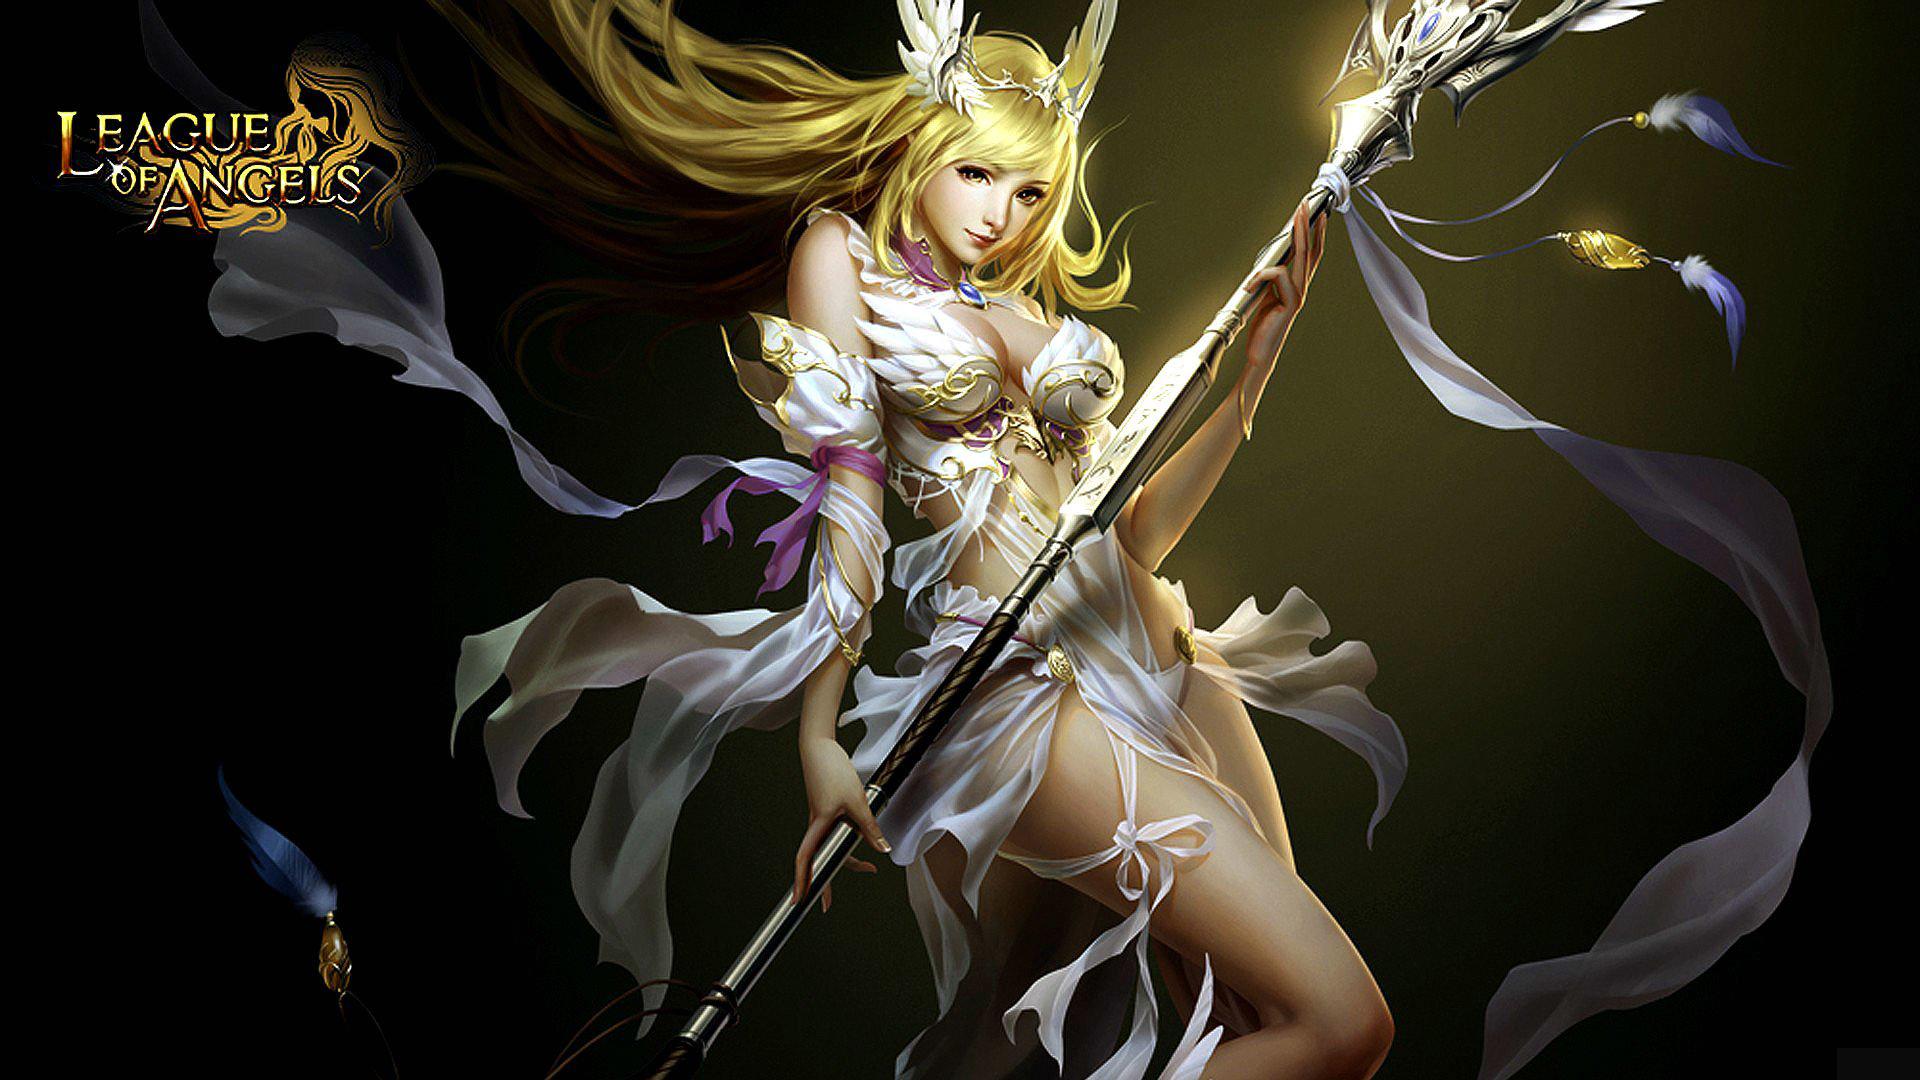 Iphone wallpaper los angeles - League Of Angels Wallpapers Angel Warrior Fantasy Wallpaper